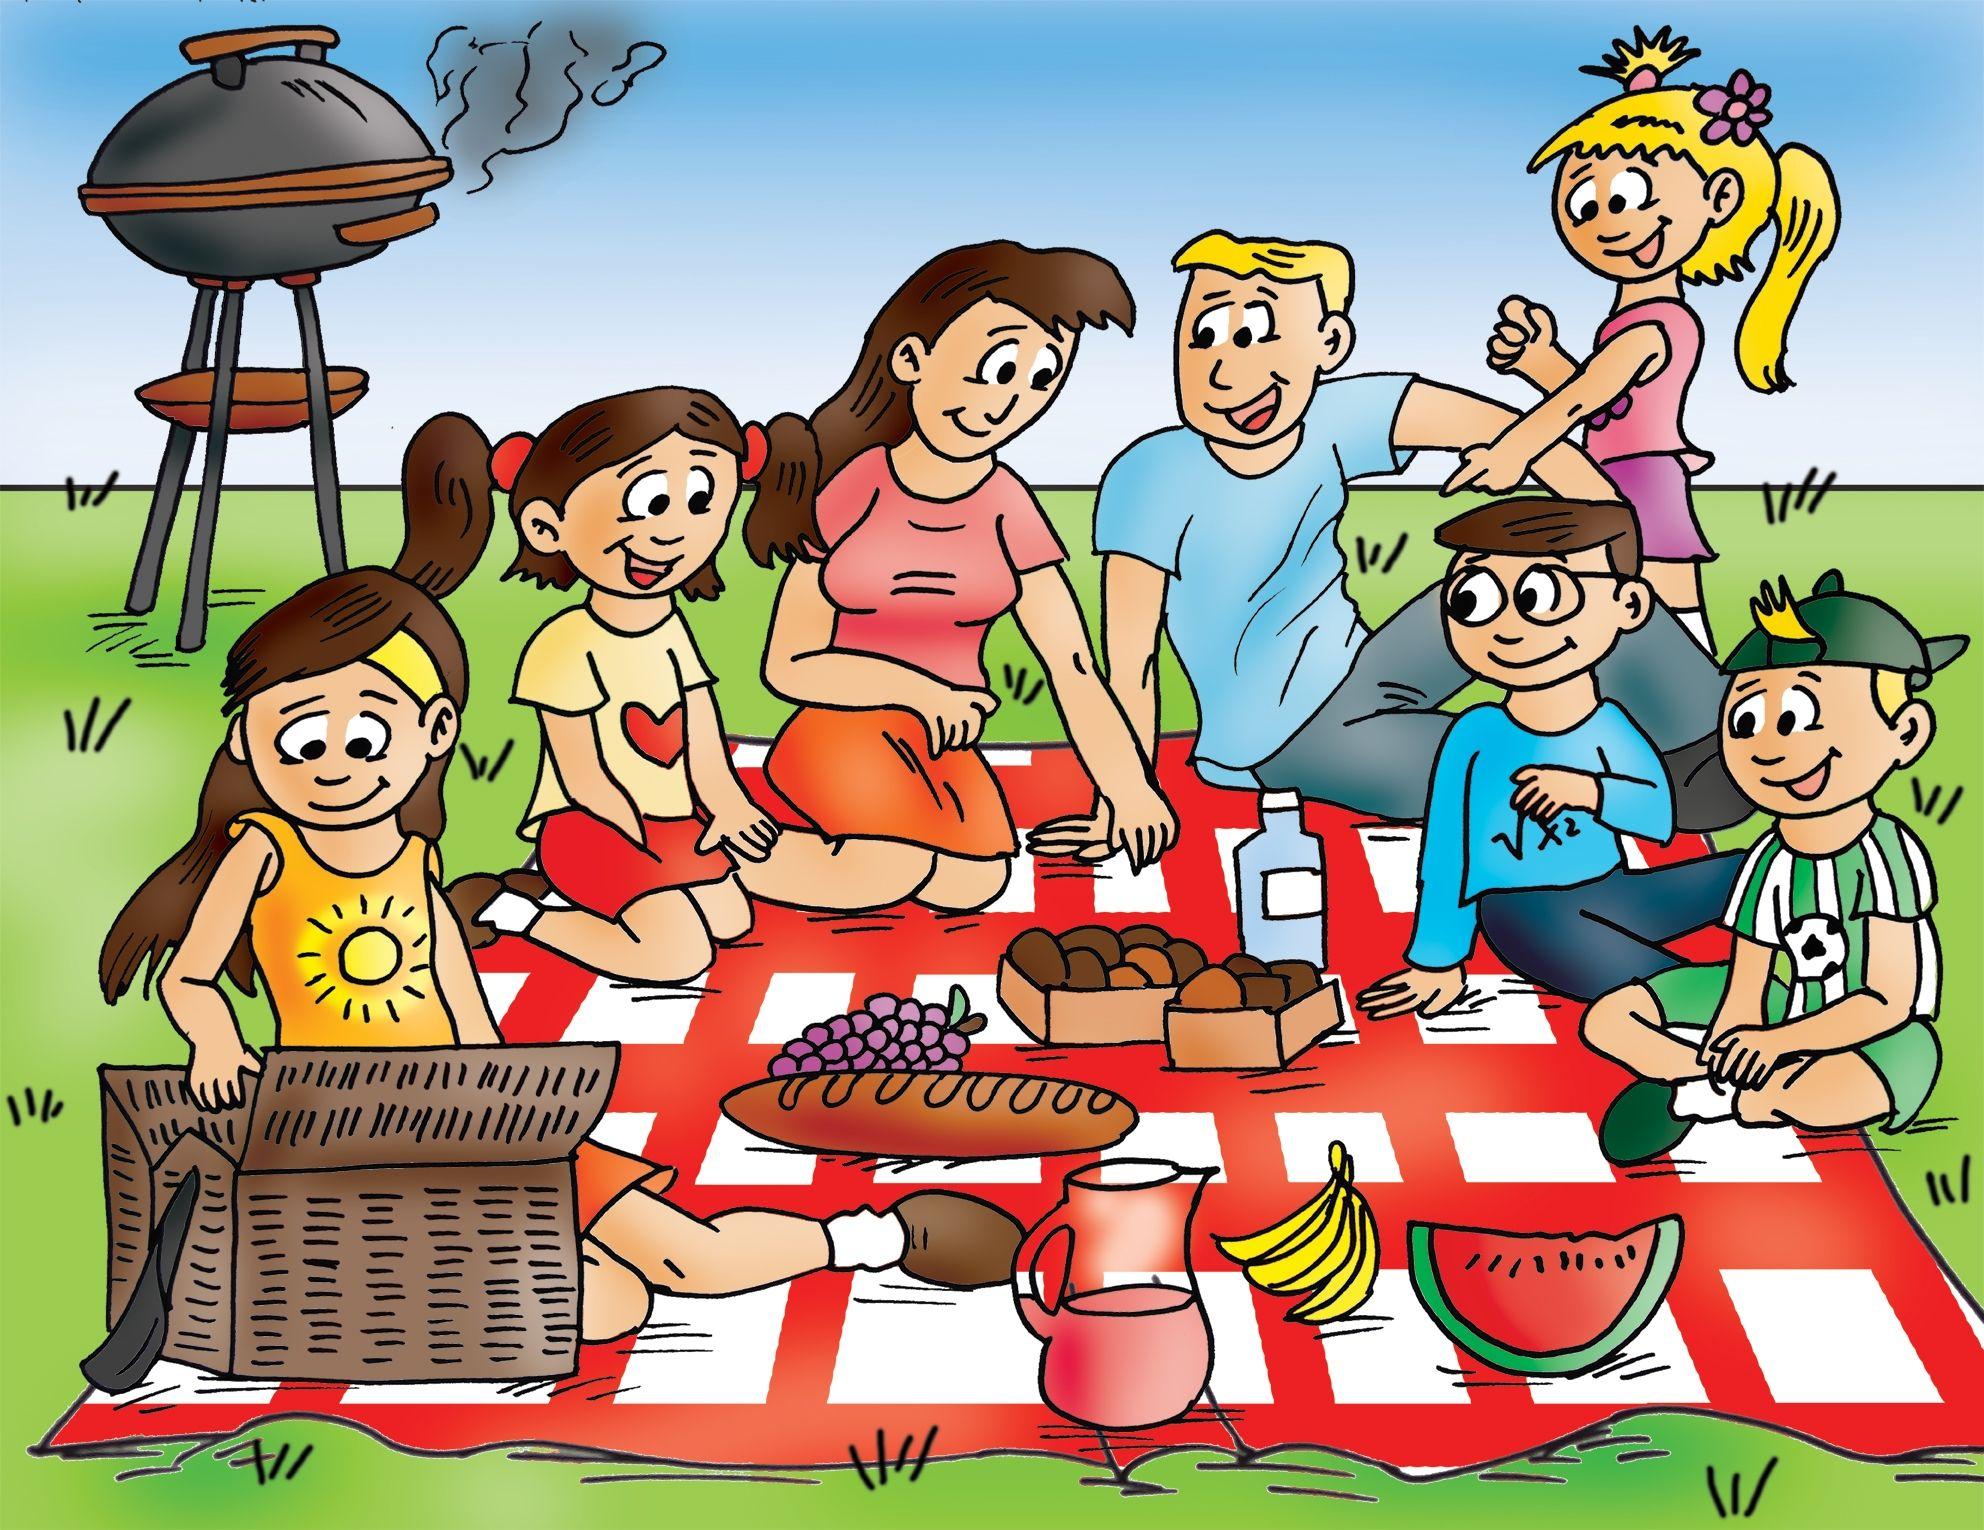 Picnic clipart funny Picnic t8zi67 picnic clipart clipart